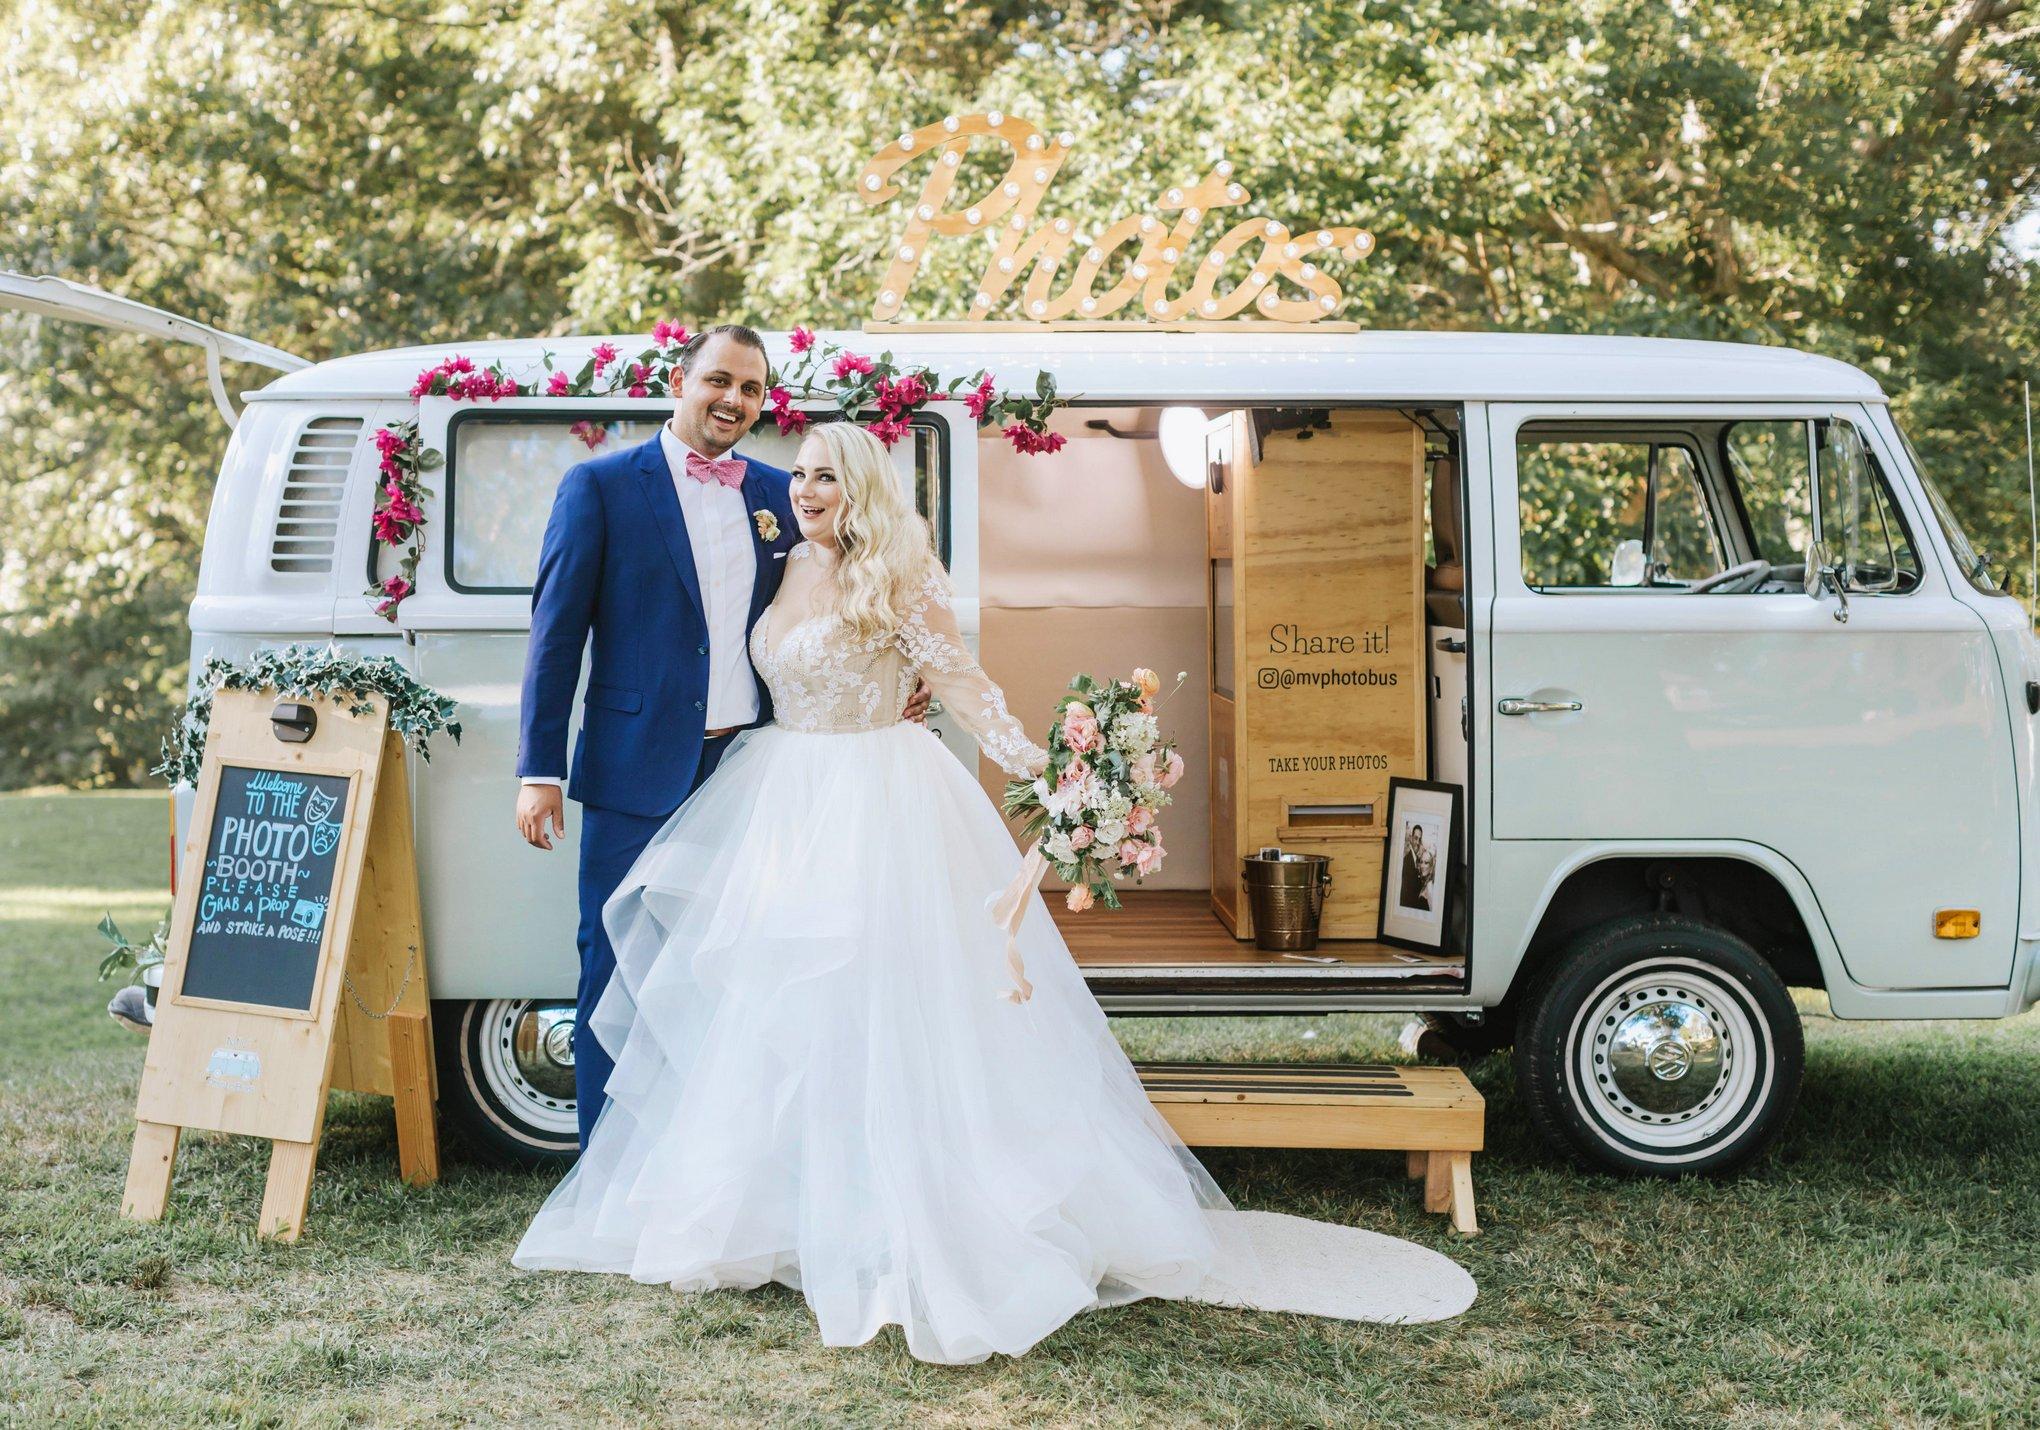 Marthas-Vineyard-Wedding-Photographer-Beach-Plum-Inn-41.jpg